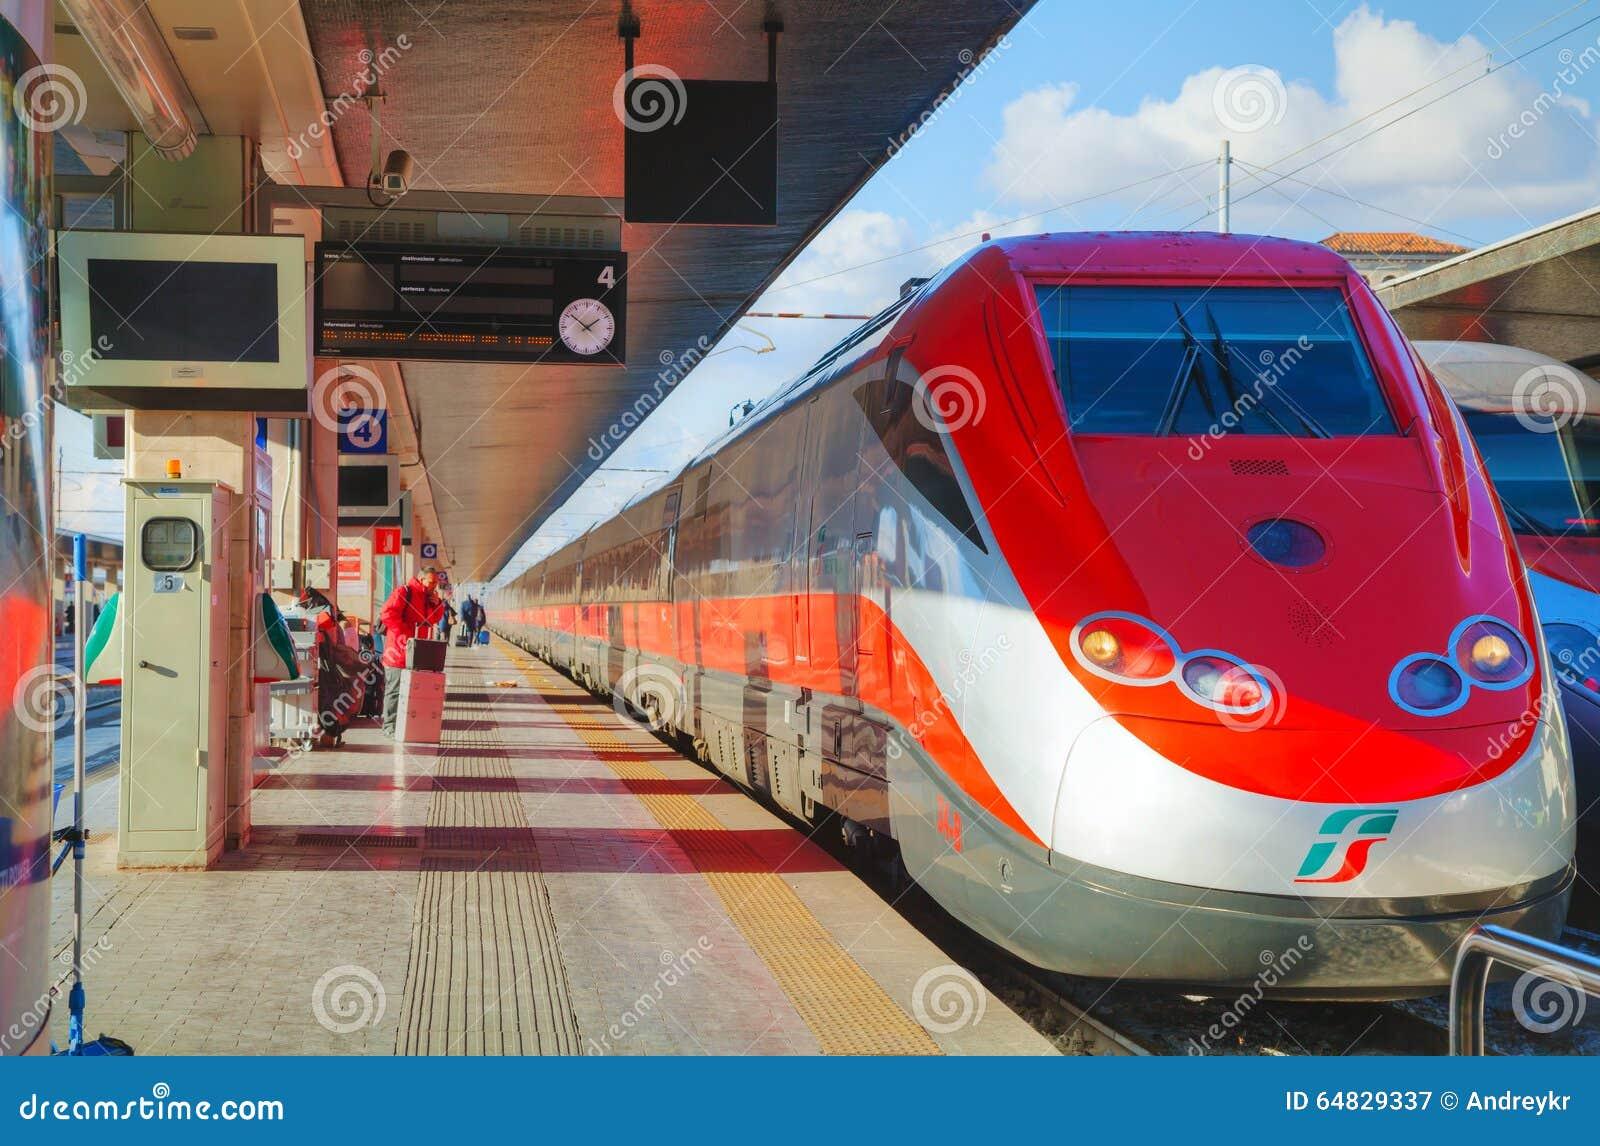 Train at Santa Lucia station in Venice